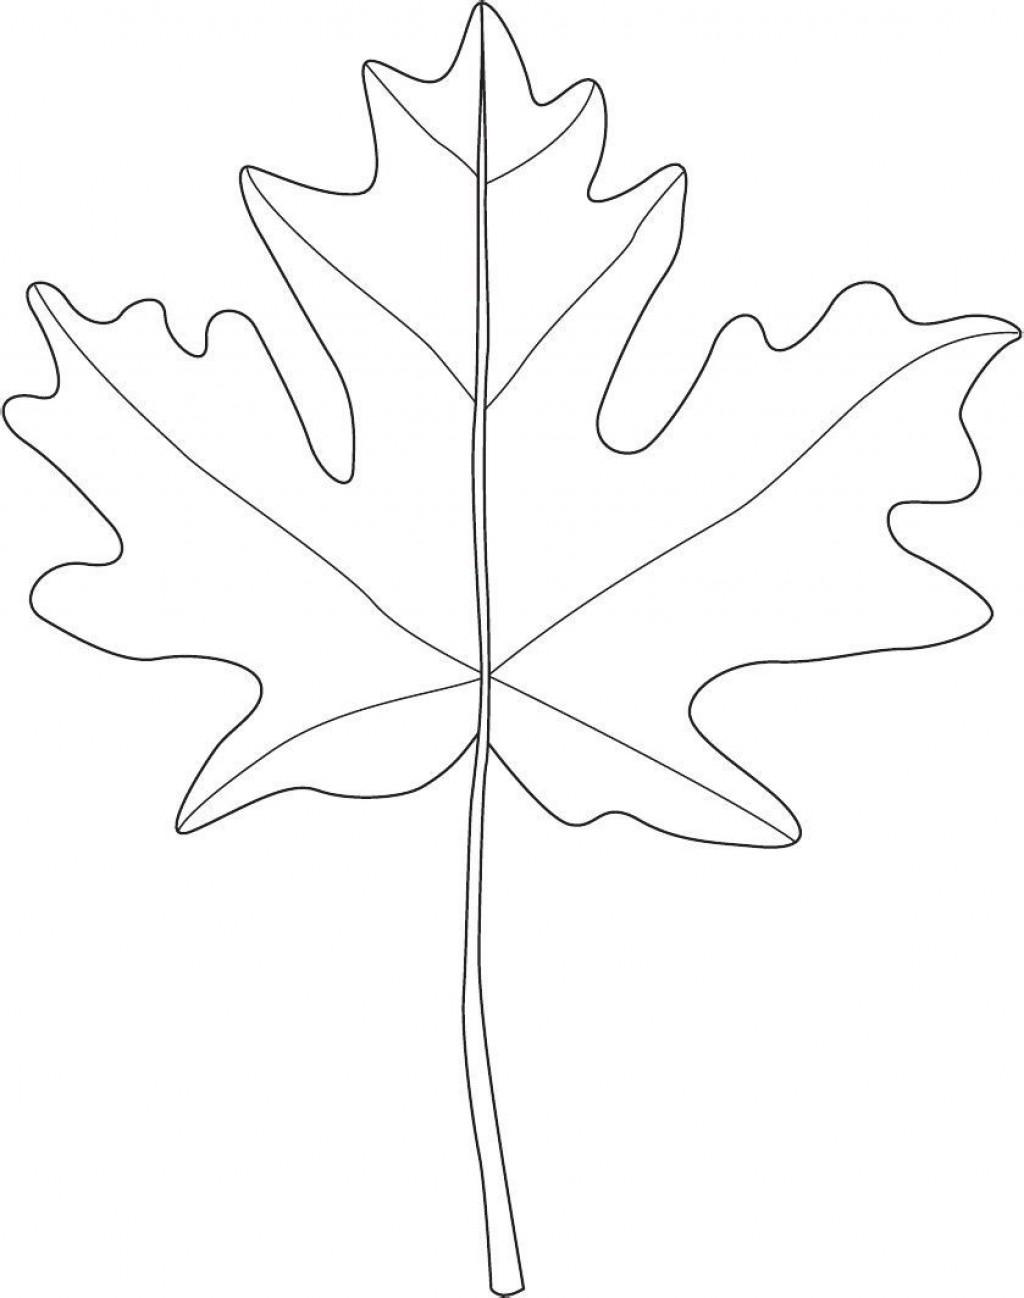 001 Marvelou Blank Leaf Template With Line Photo  Lines PrintableLarge